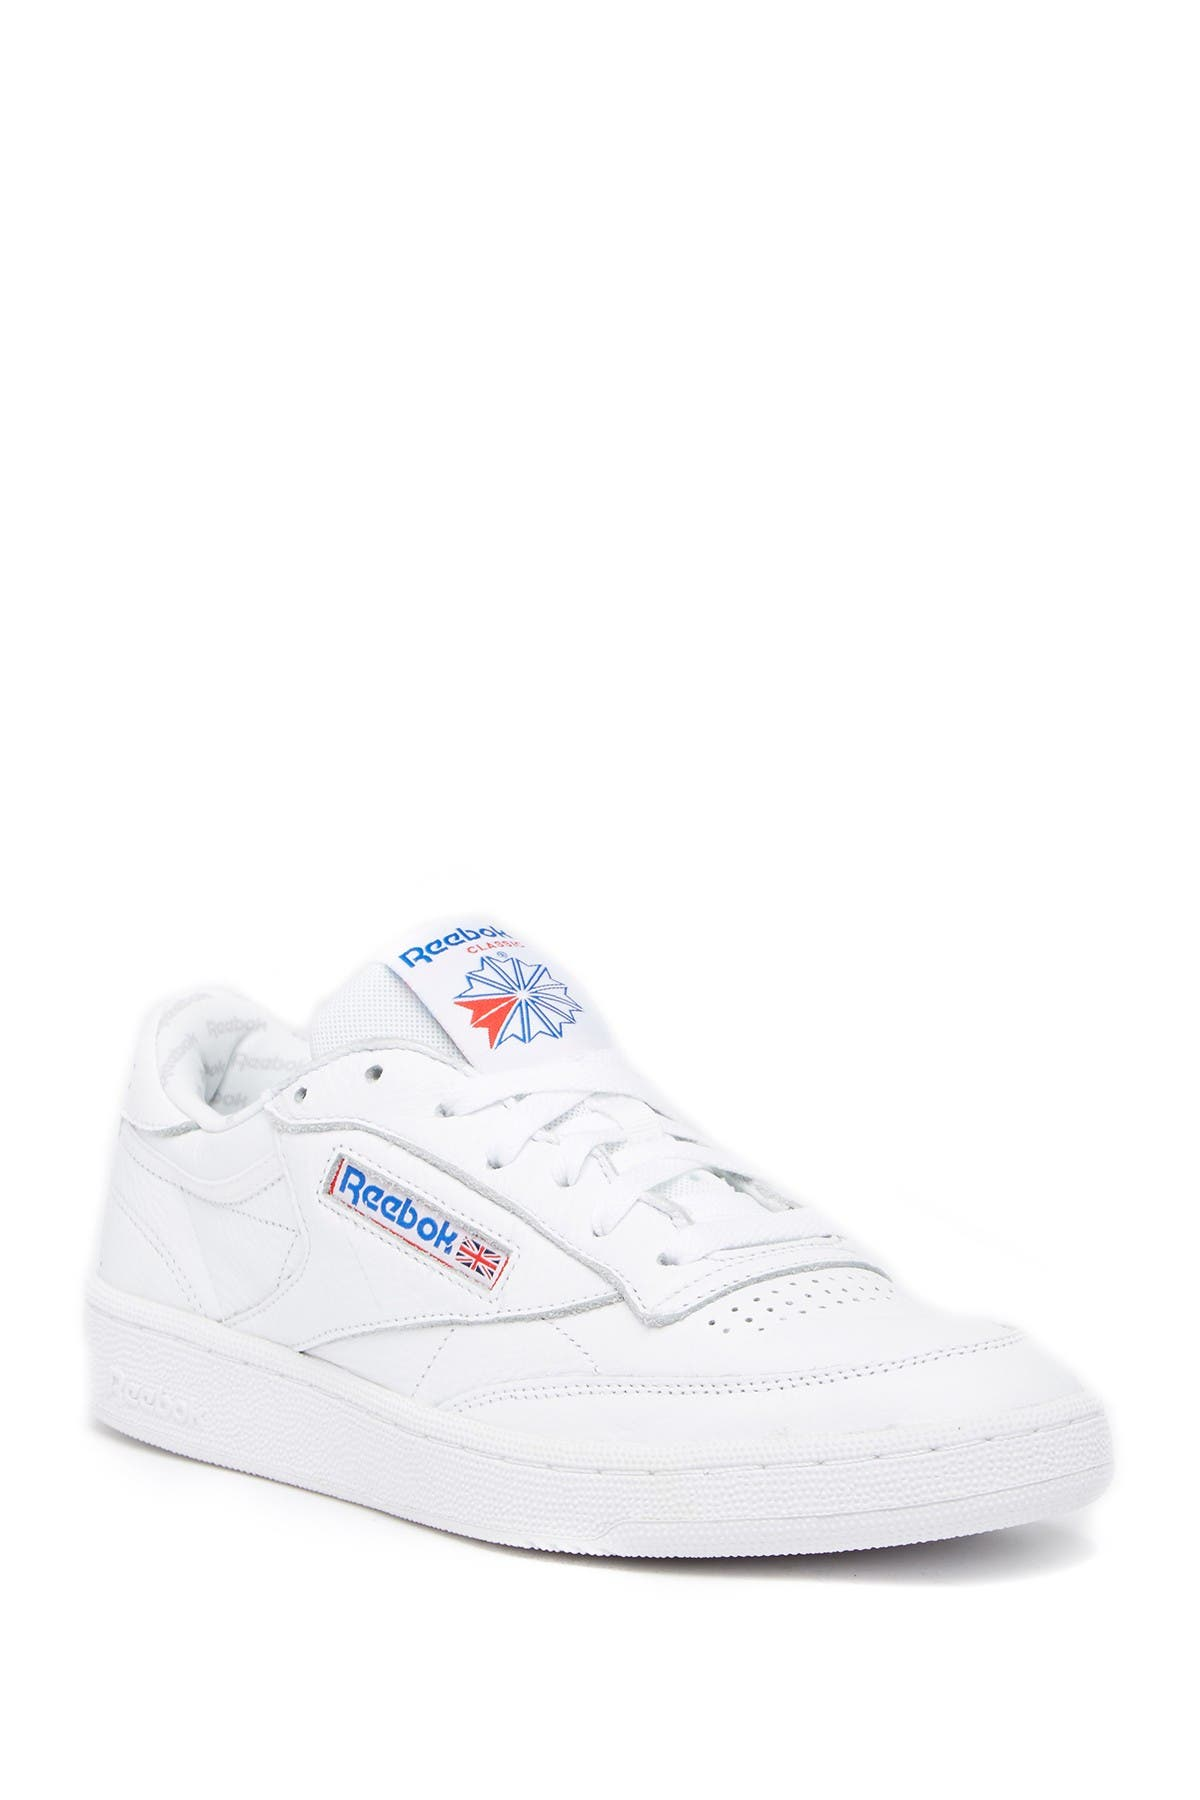 Reebok | Club C 85 SO Leather Sneaker